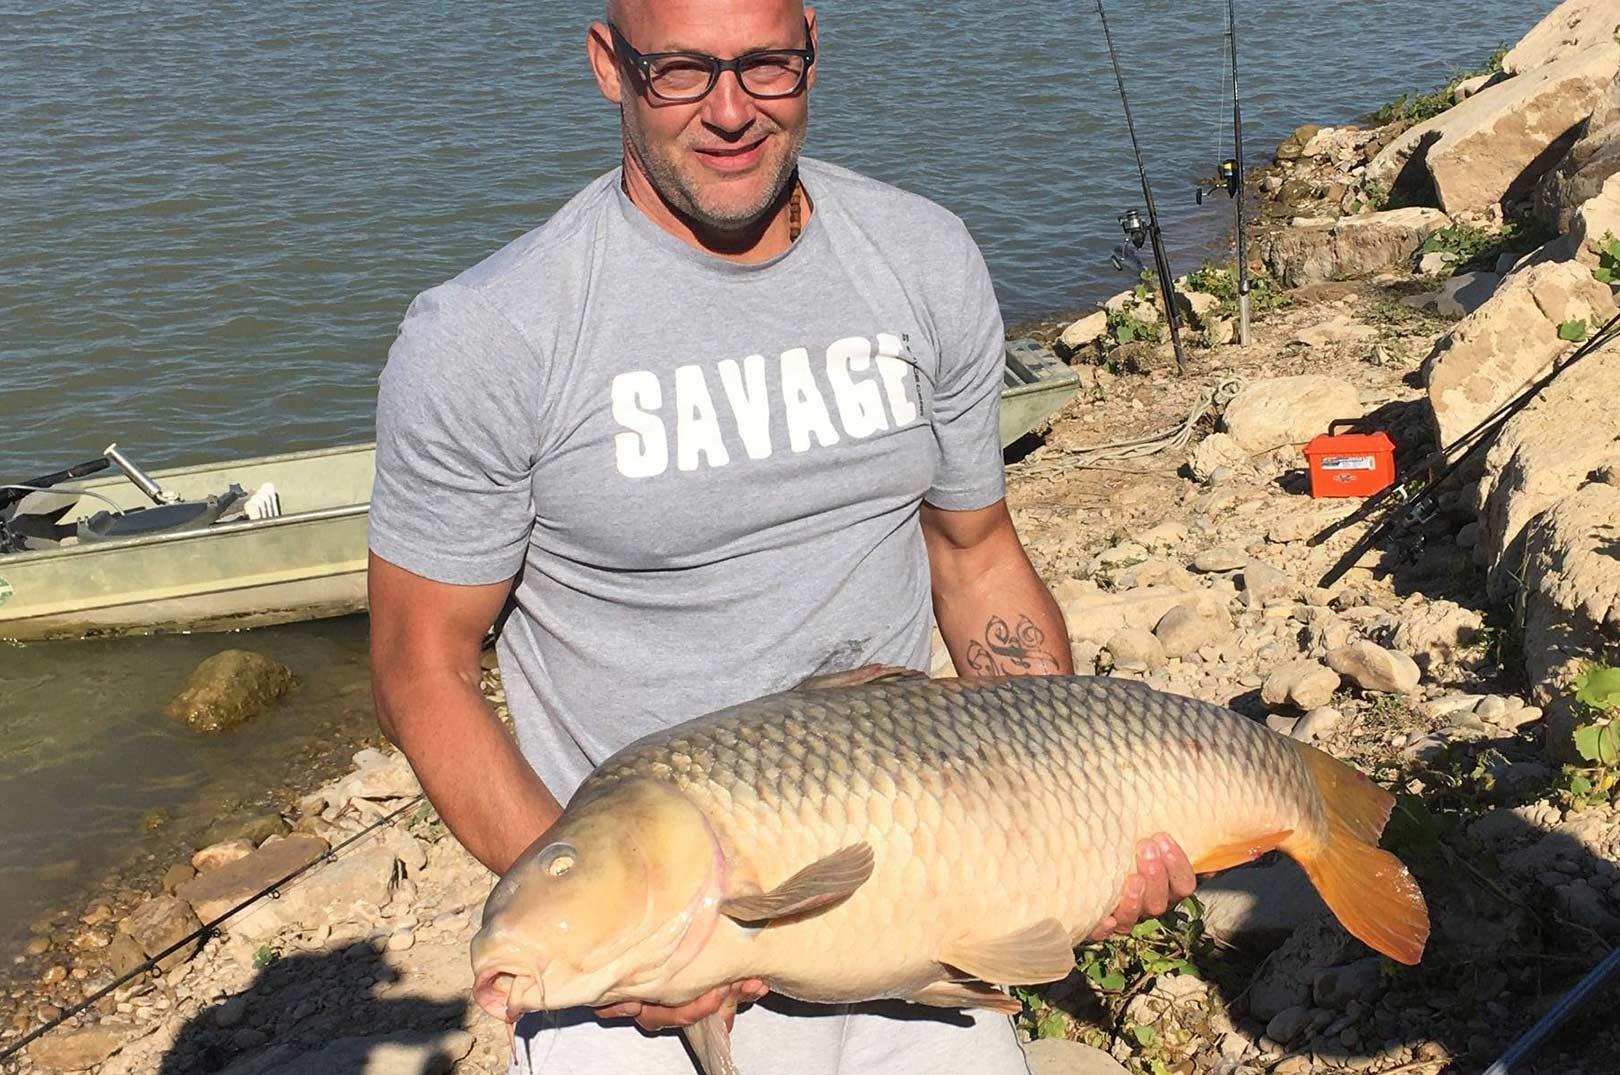 Christian Klæbel med sin flotte 21 kilos karpe fra Ebro. Øverst Carsten med sin flotte malle.